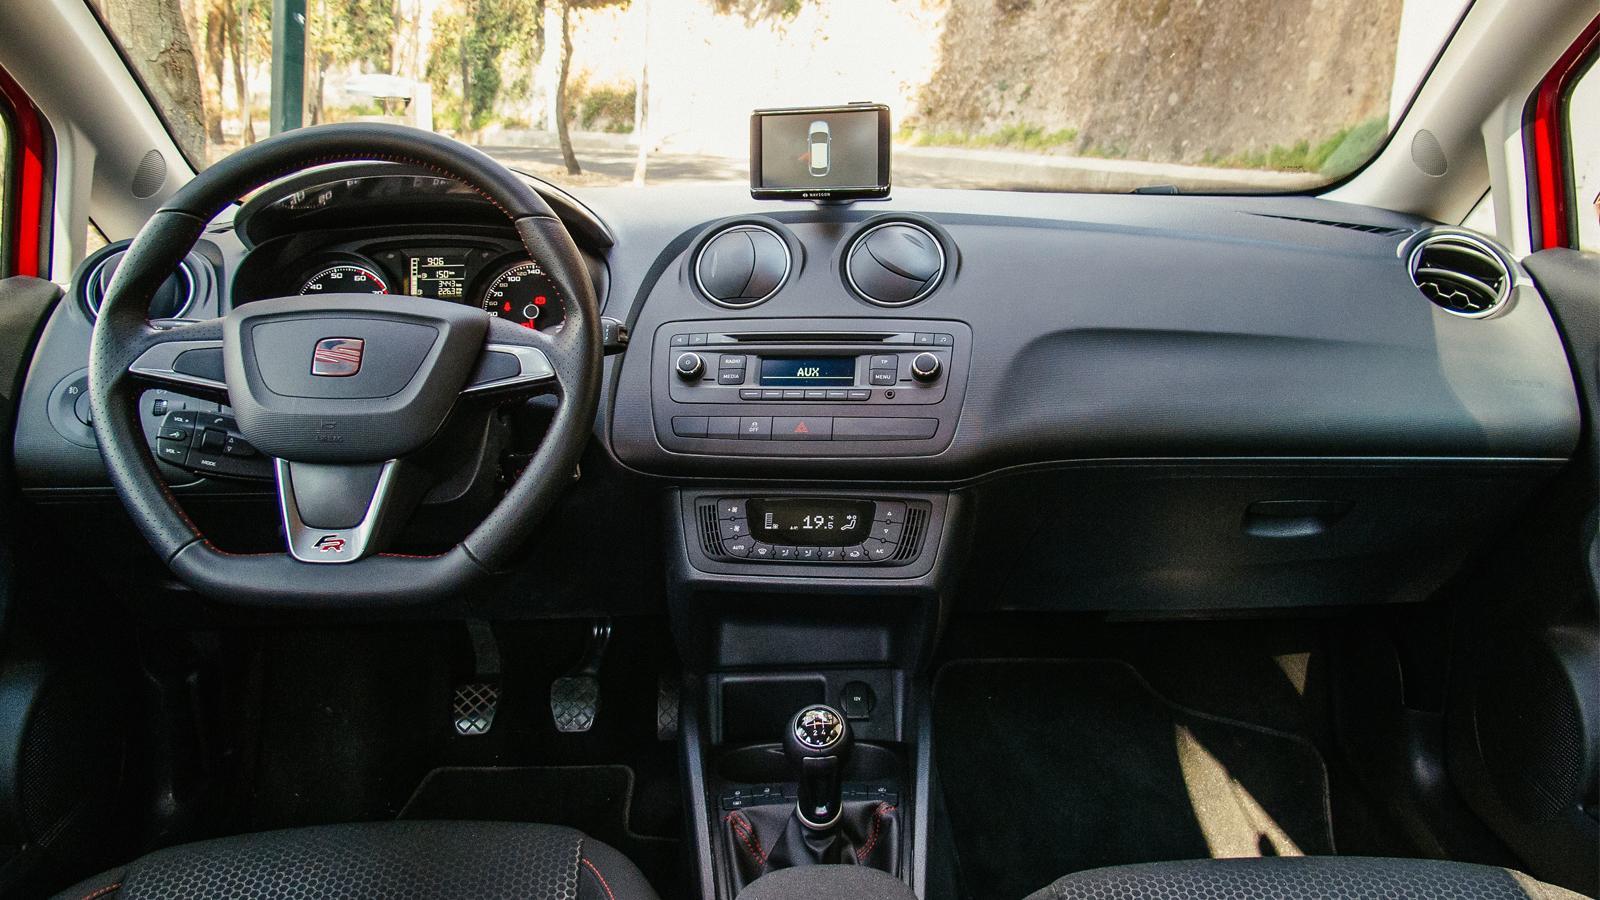 SEAT Ibiza FR 1.2 2014 a prueba - Autocosmos.com